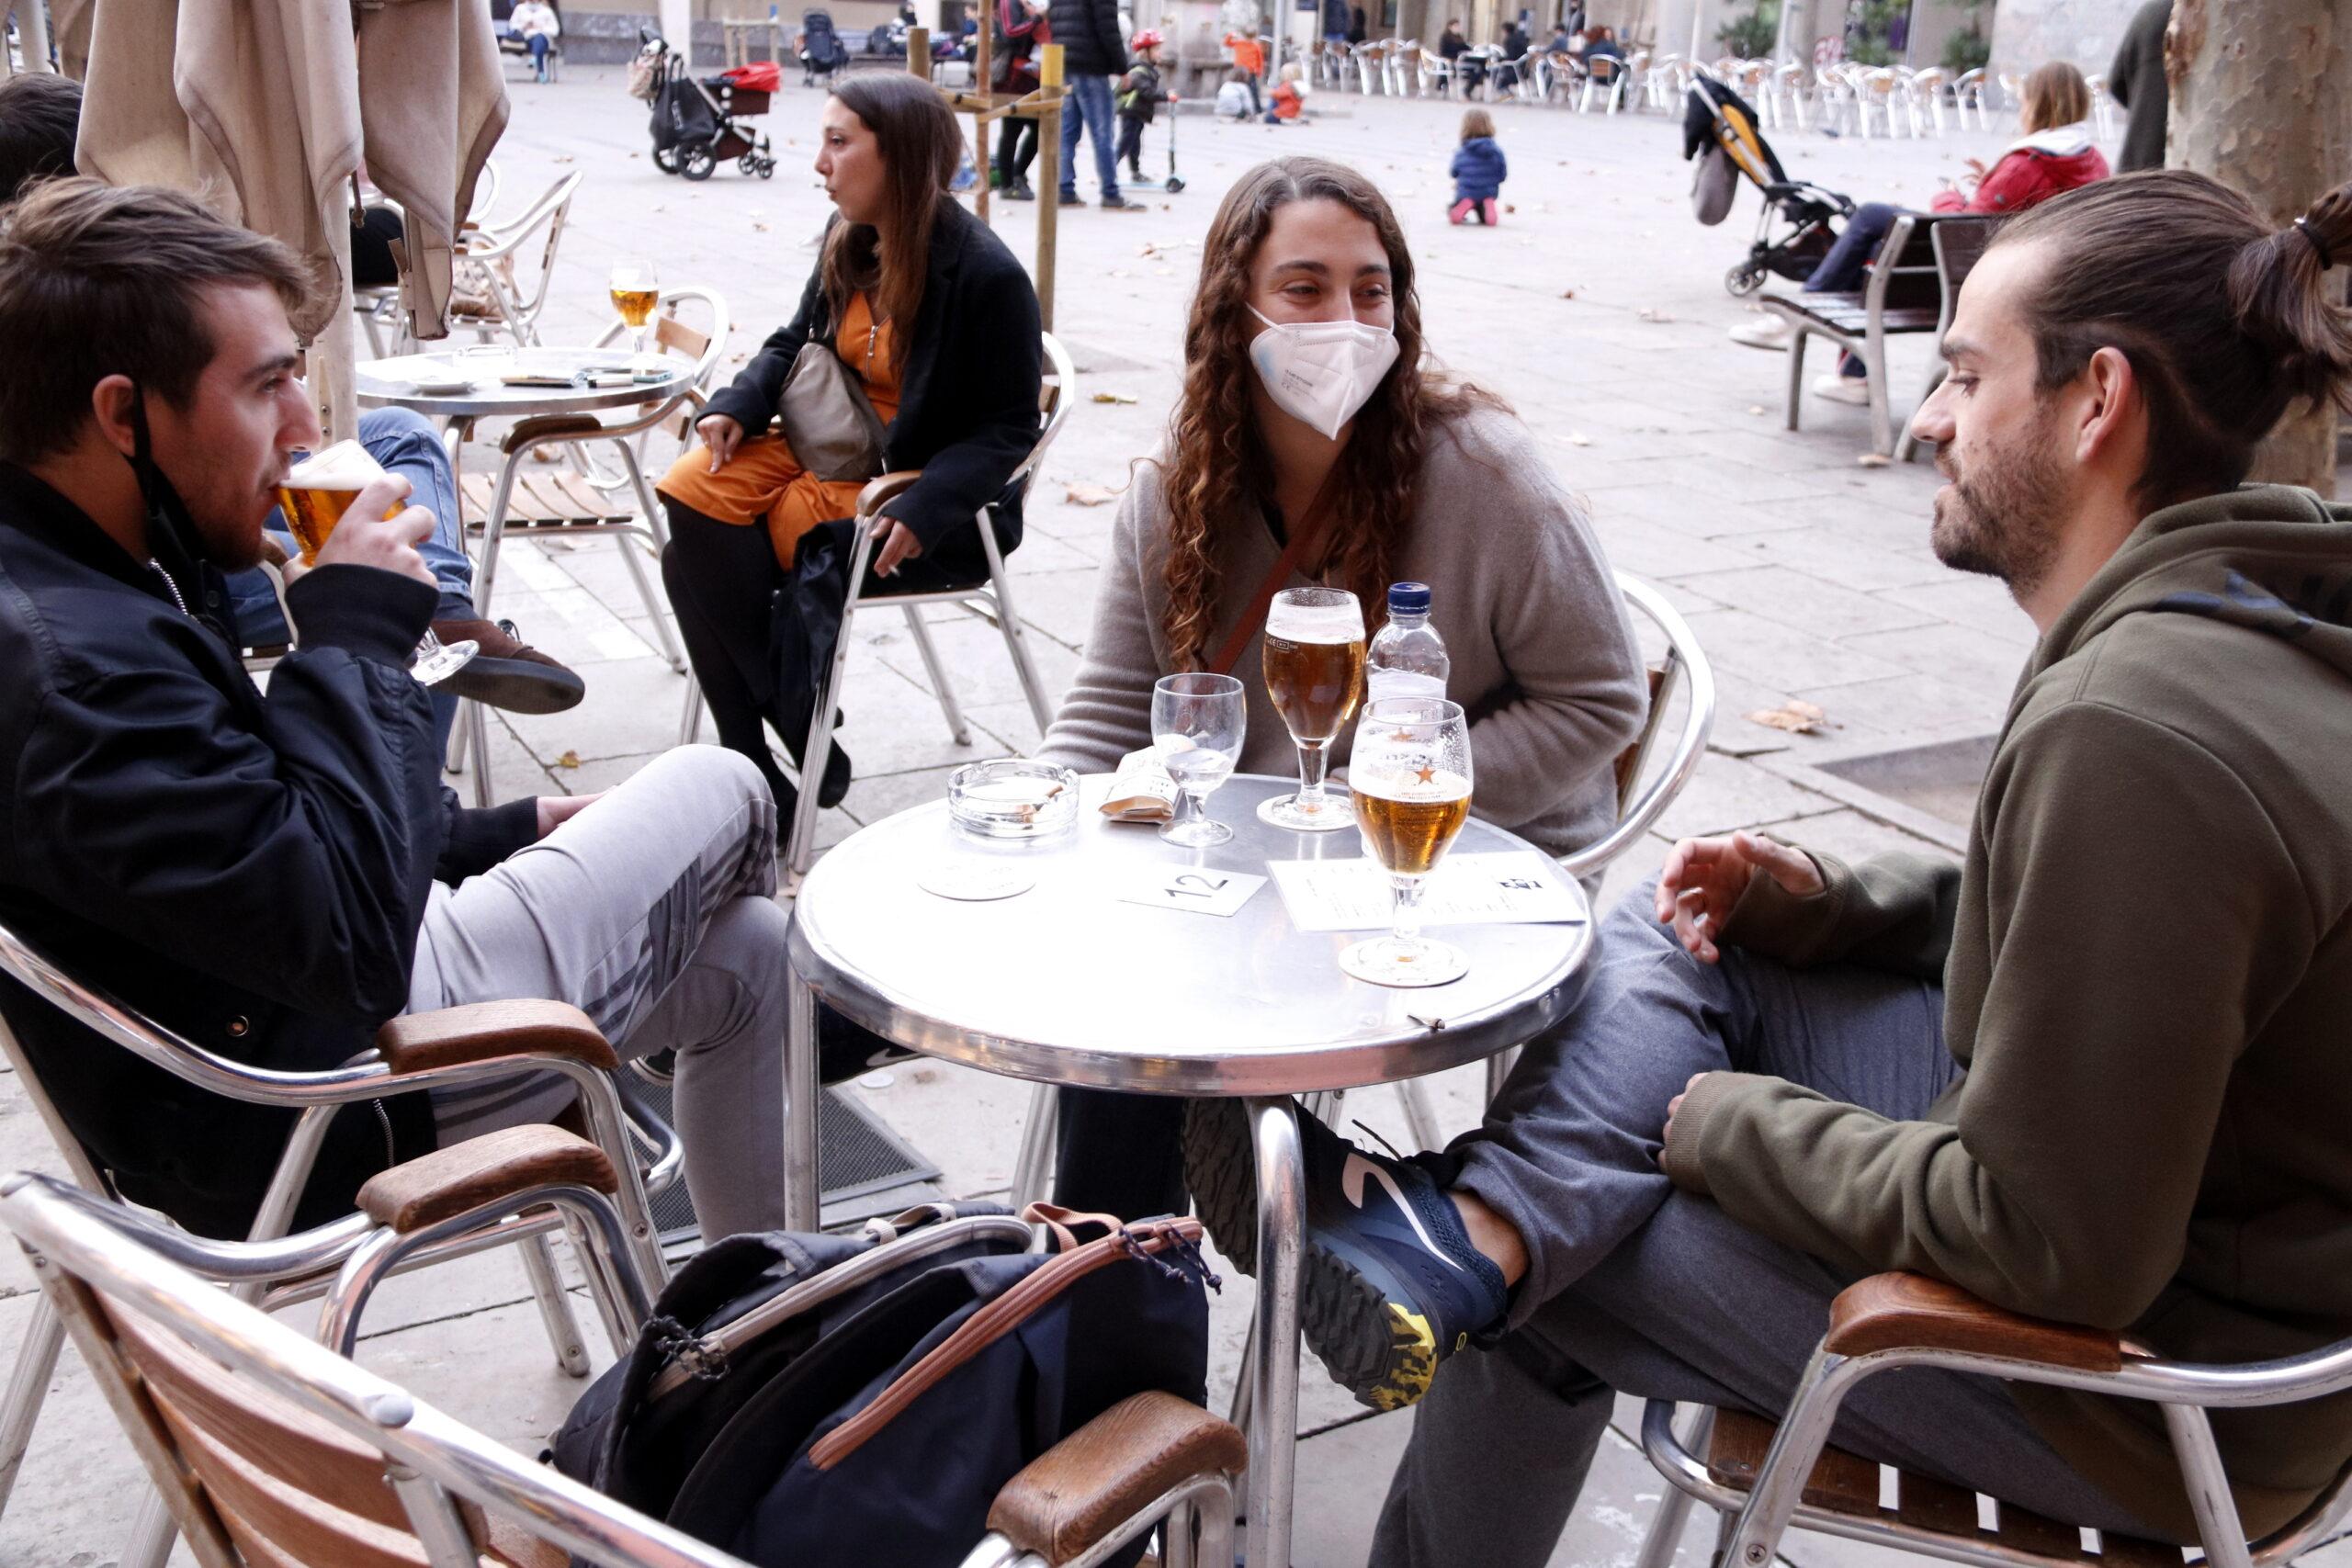 Uns joves prenen una cervesa en una terrassa a la plaça de la Virreina de Barcelona | ACN